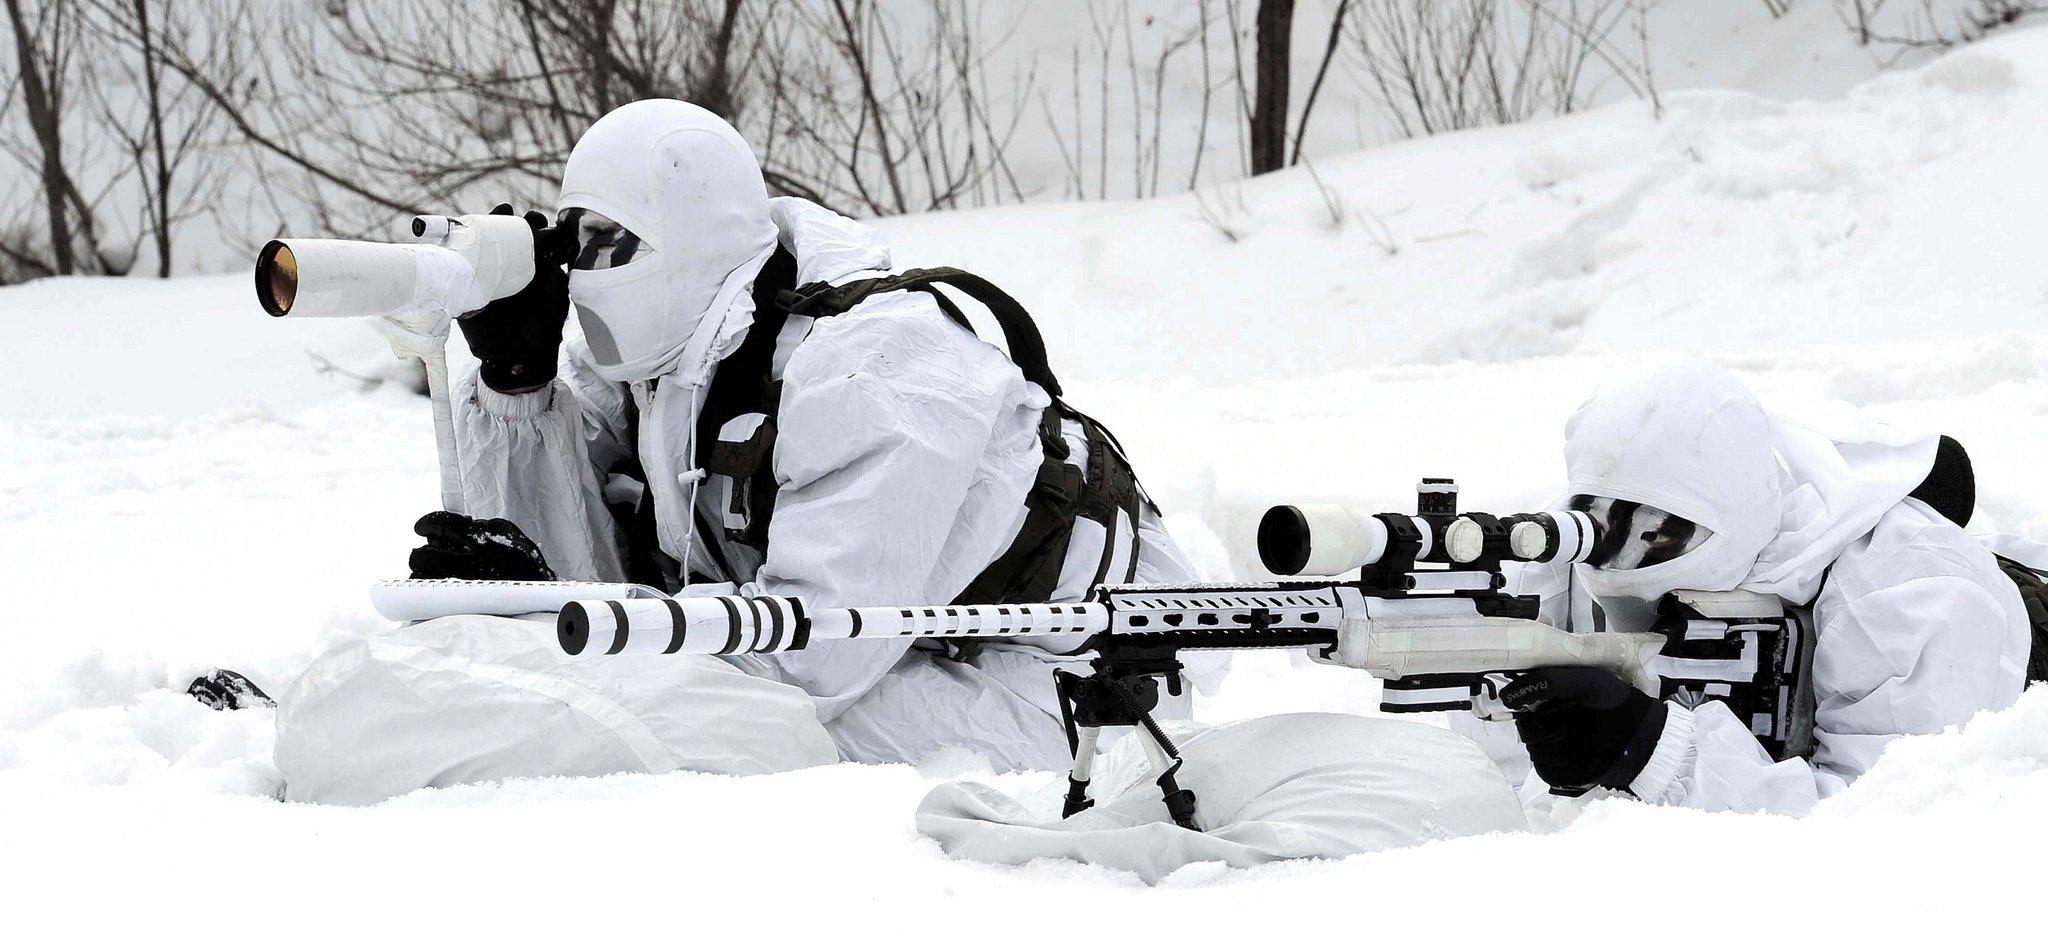 Army Sniper Wallpaper 2048x930 438005 Wallpaperup